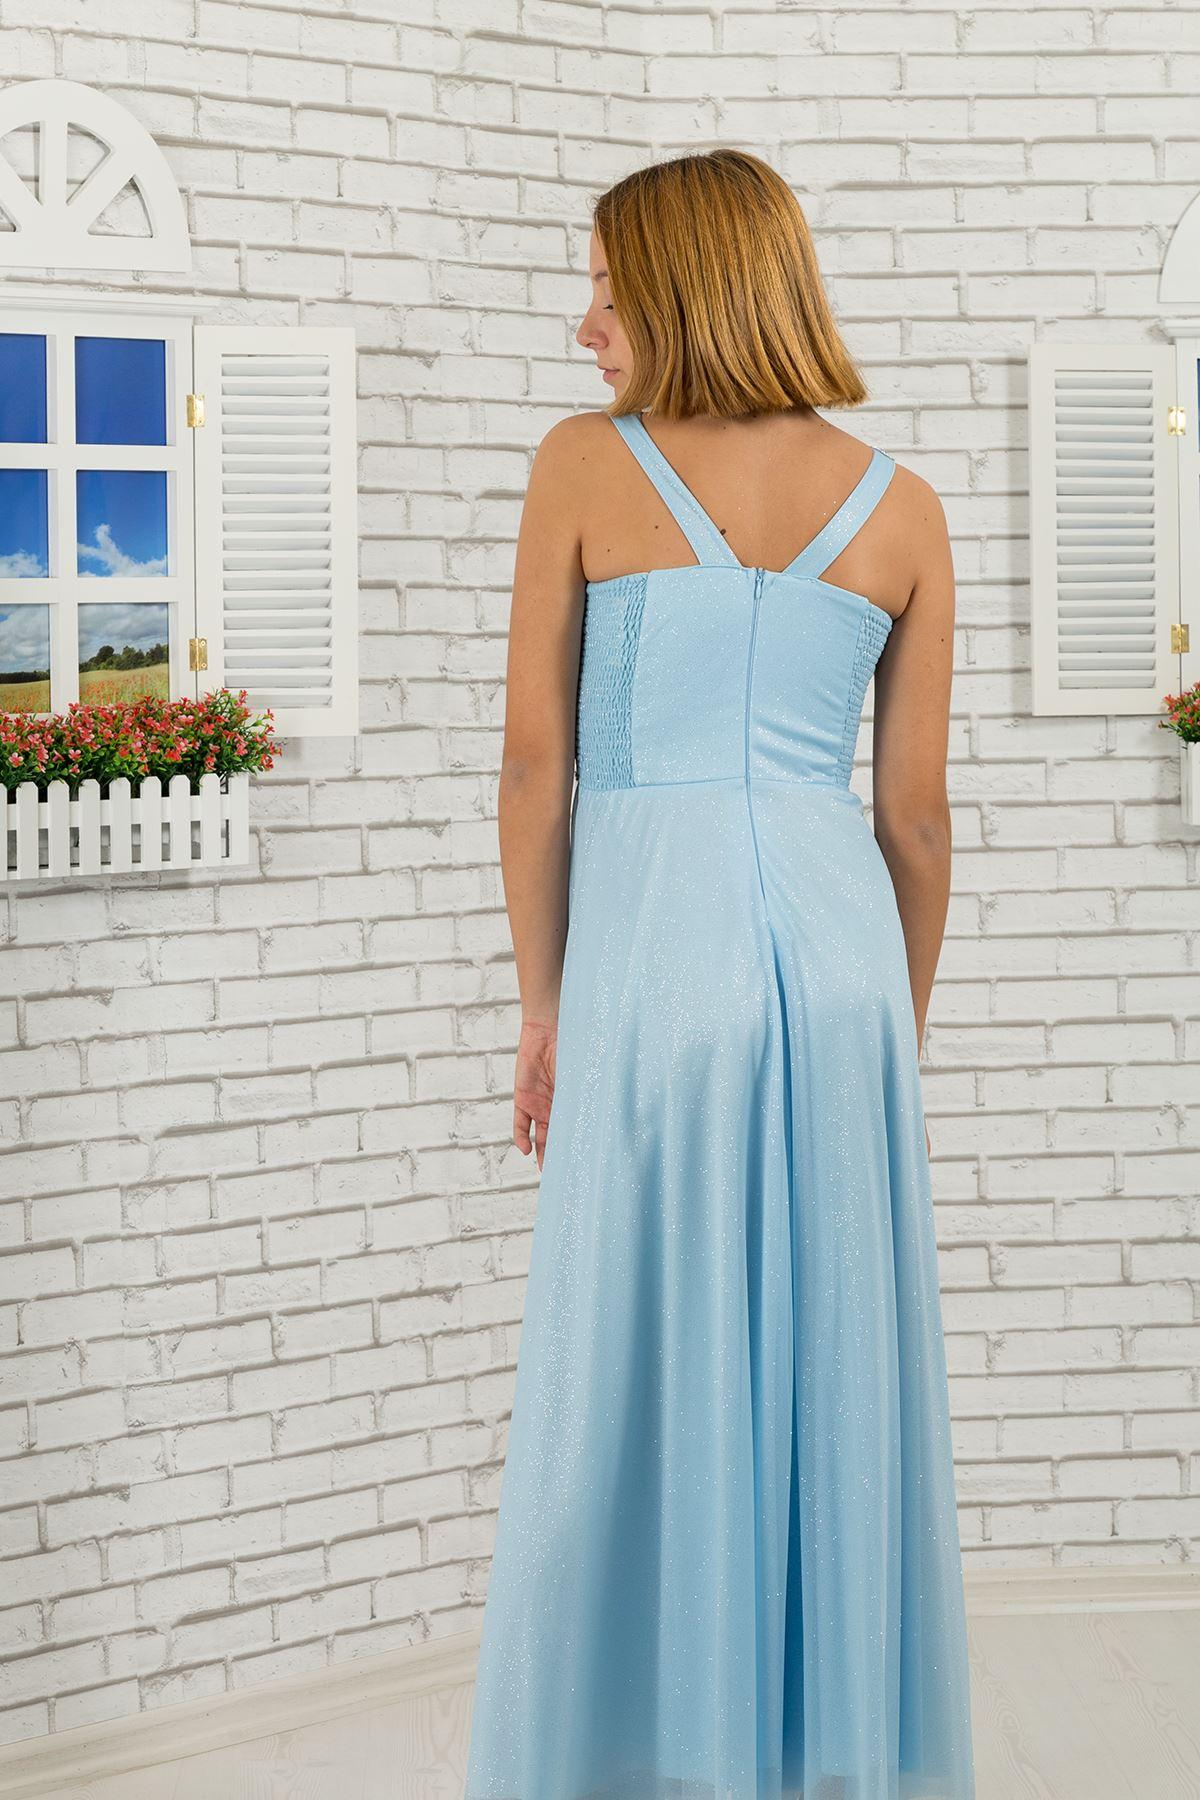 Waist stone, collar detail, silvery chiffon girl children evening dress 473 Baby Blue